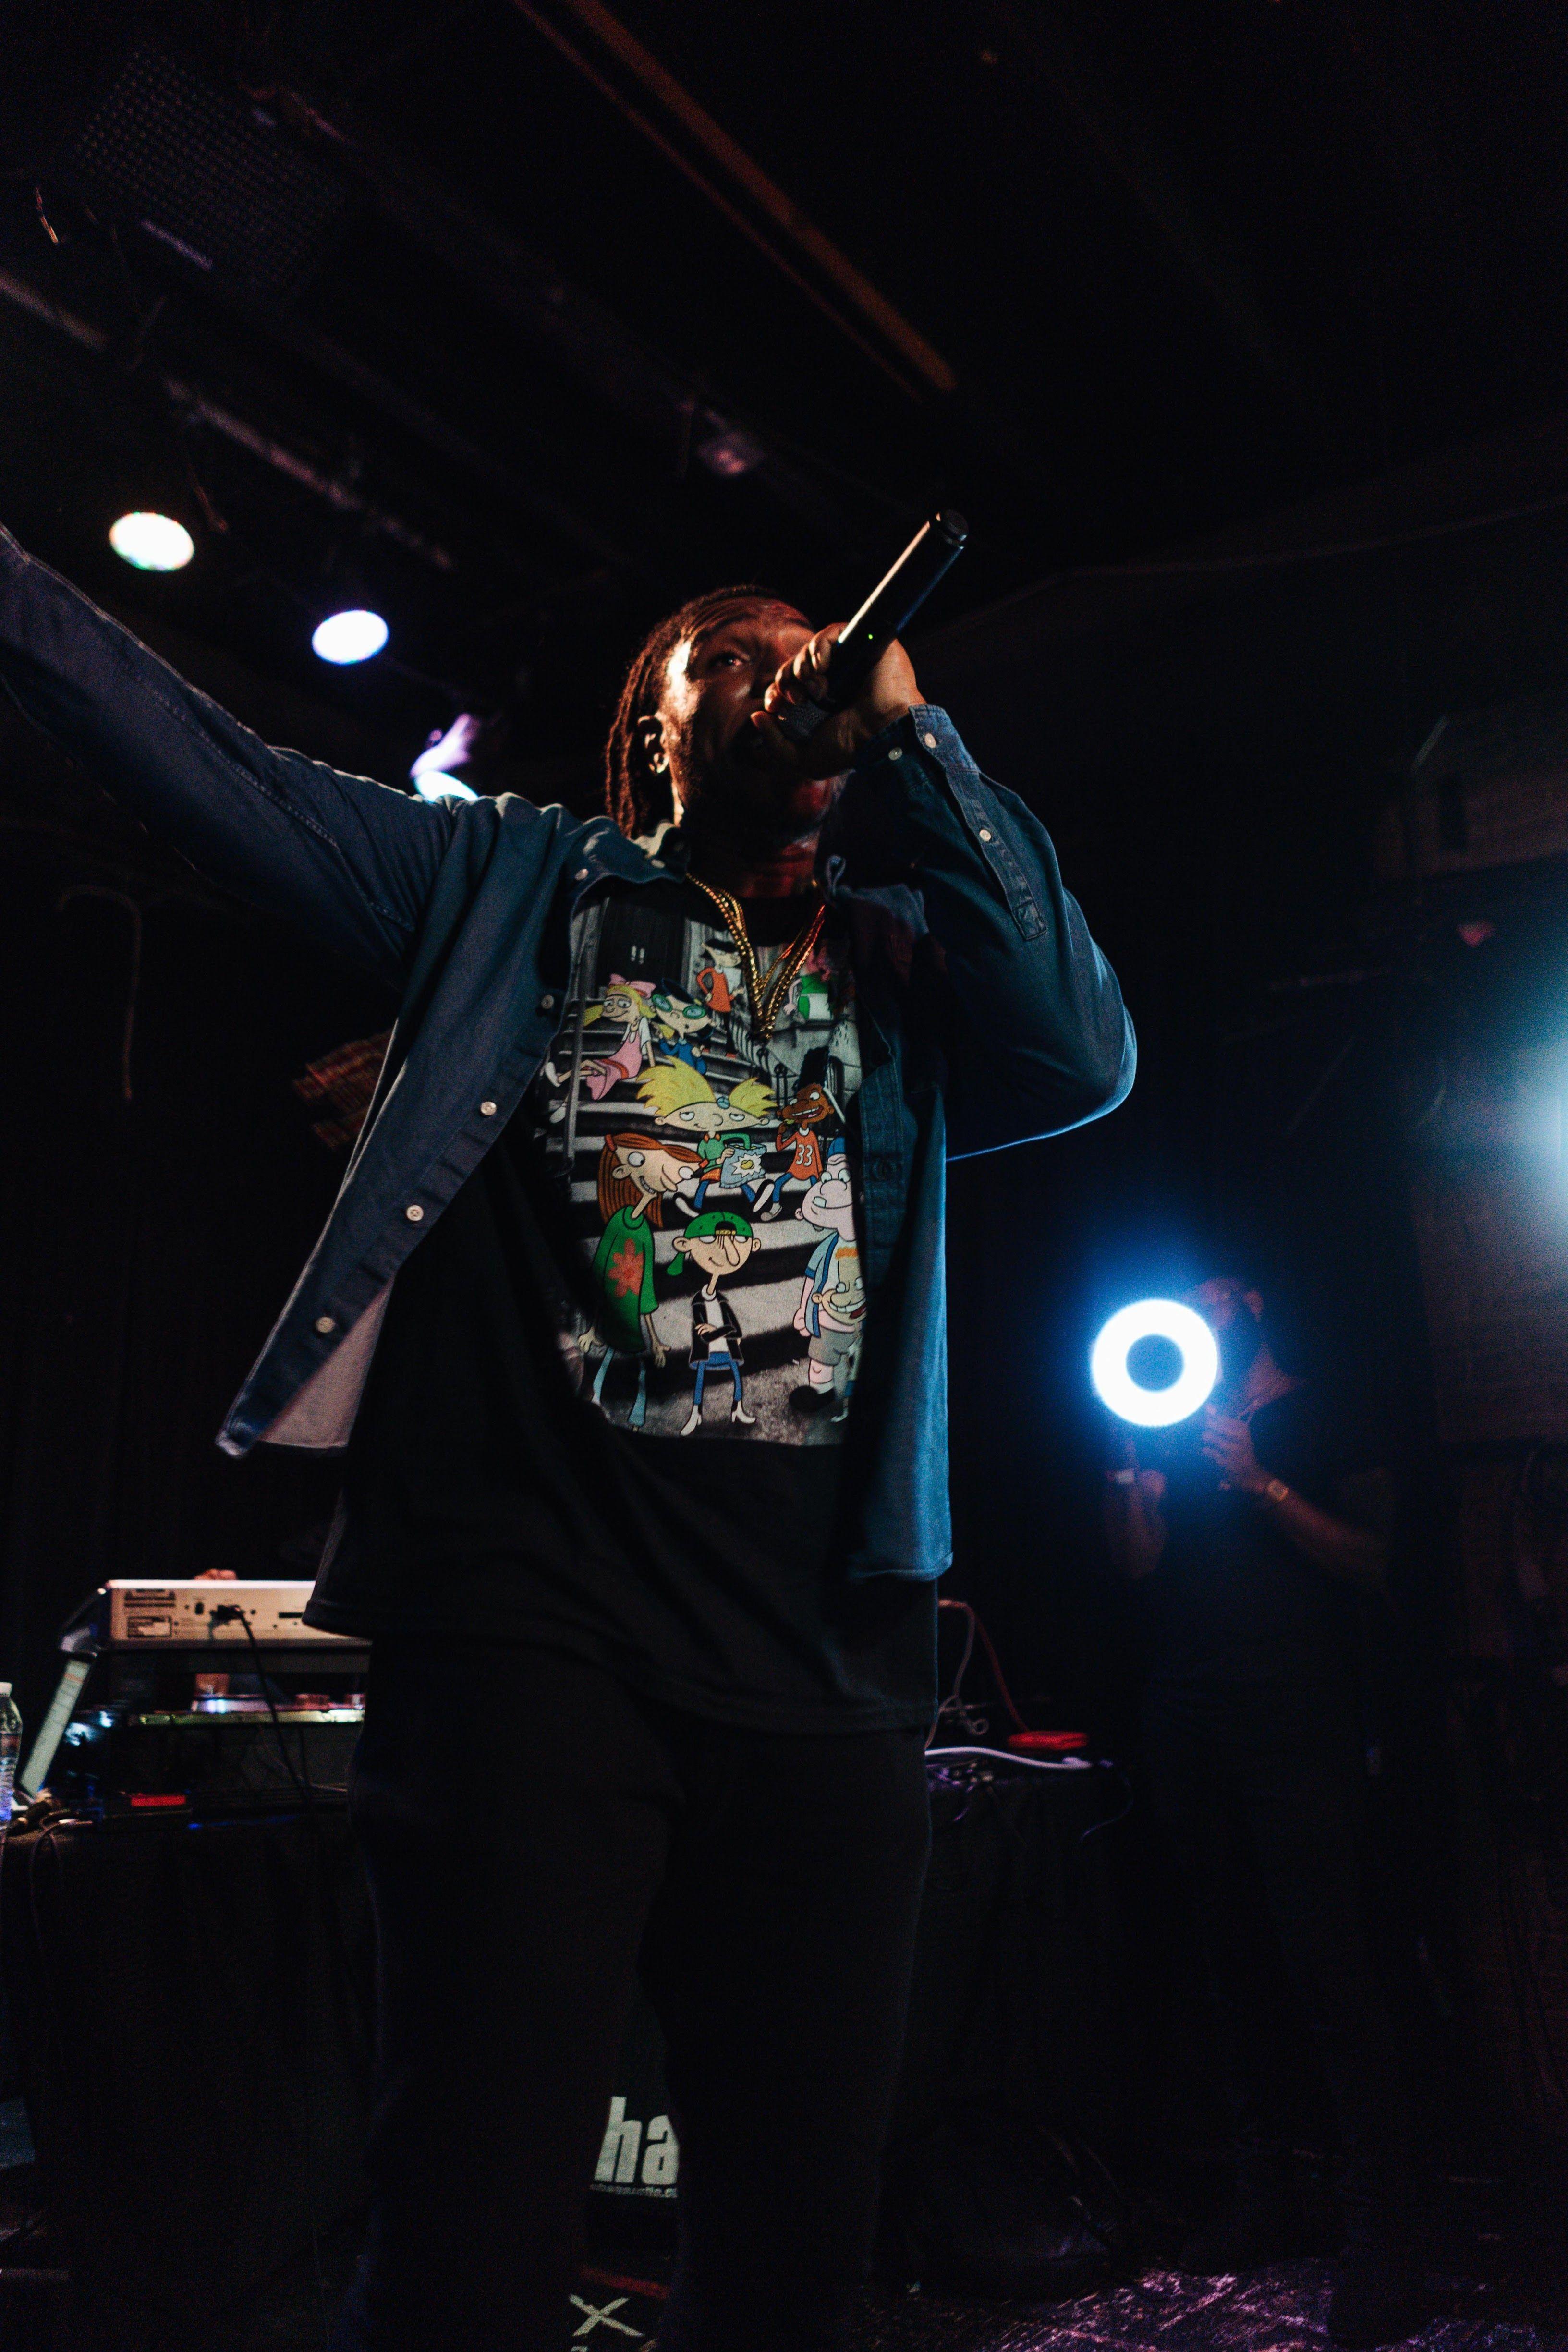 Aha gazelle in dallas tx christian hip hop hip hop rap